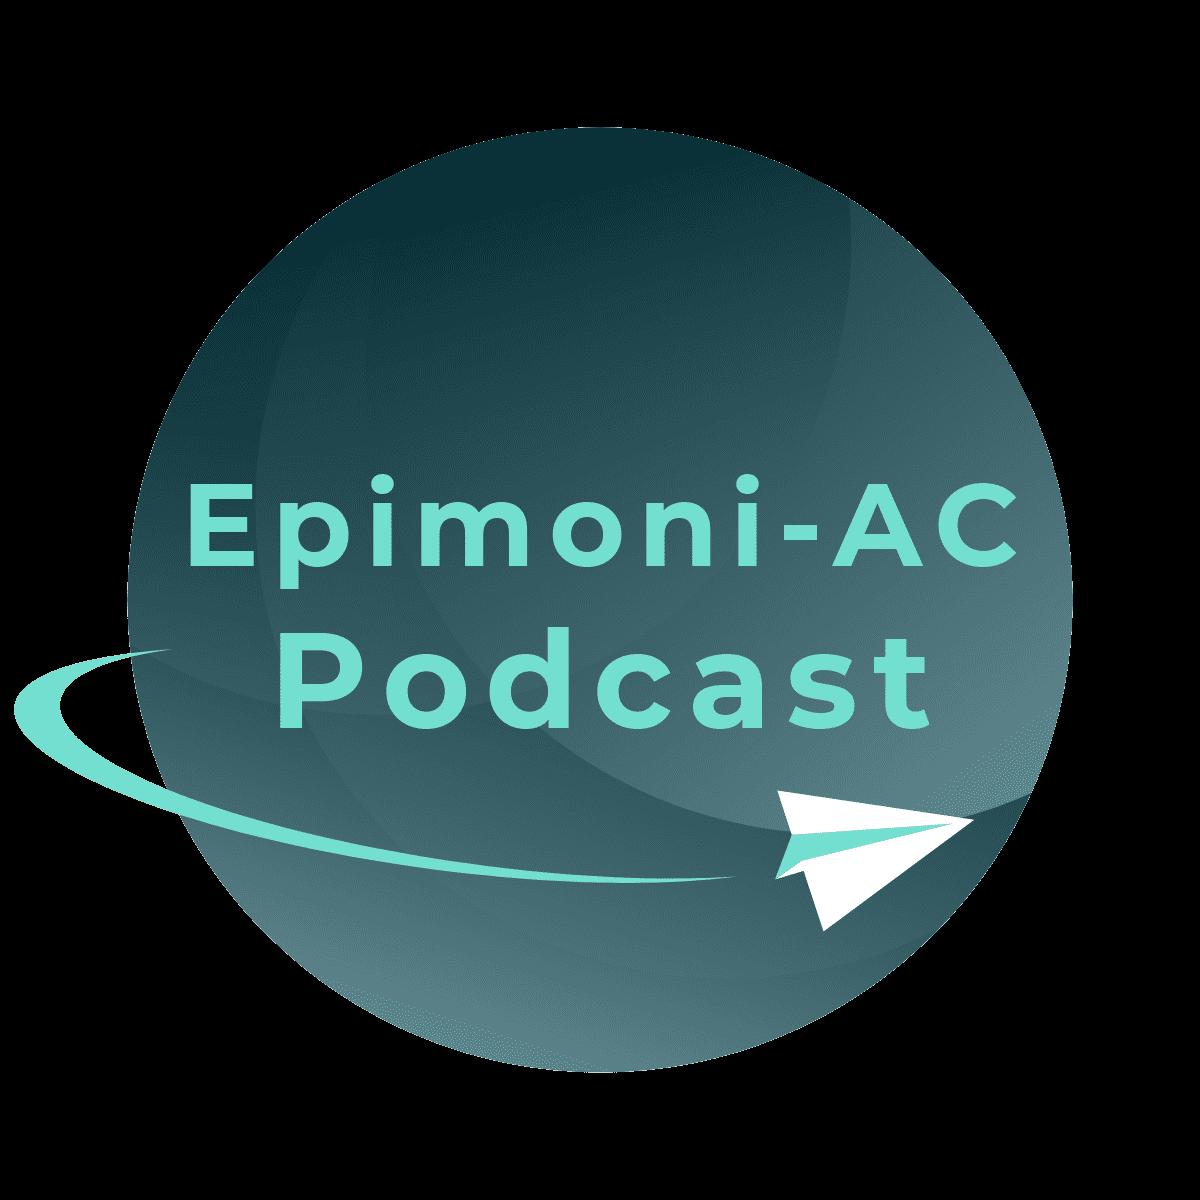 Podcast Epimoni-ac